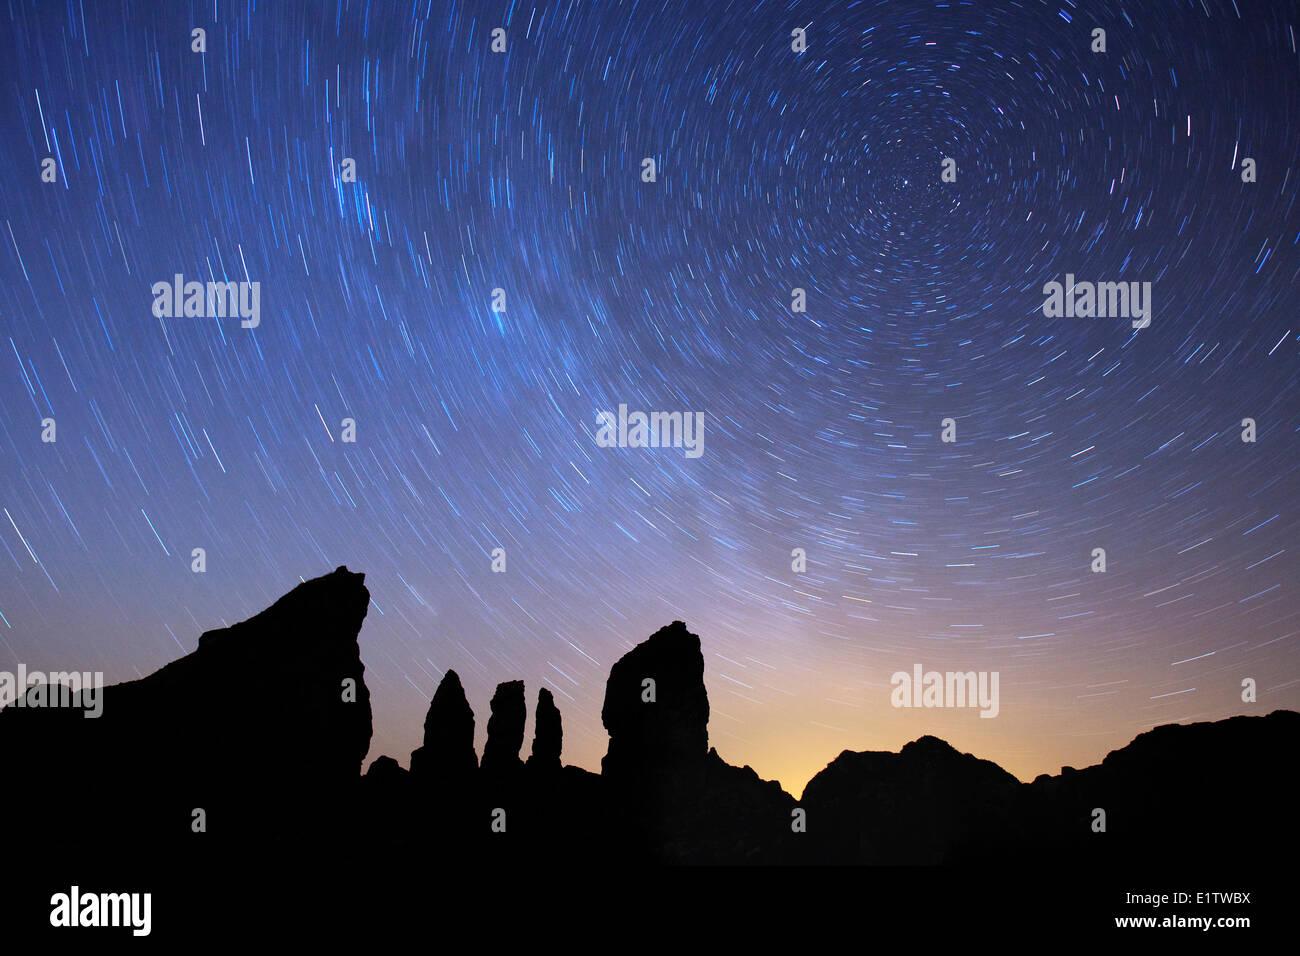 Stars spiral through the night sky over Cape Split along Nova Scotia's Bay of Fundy coast. - Stock Image